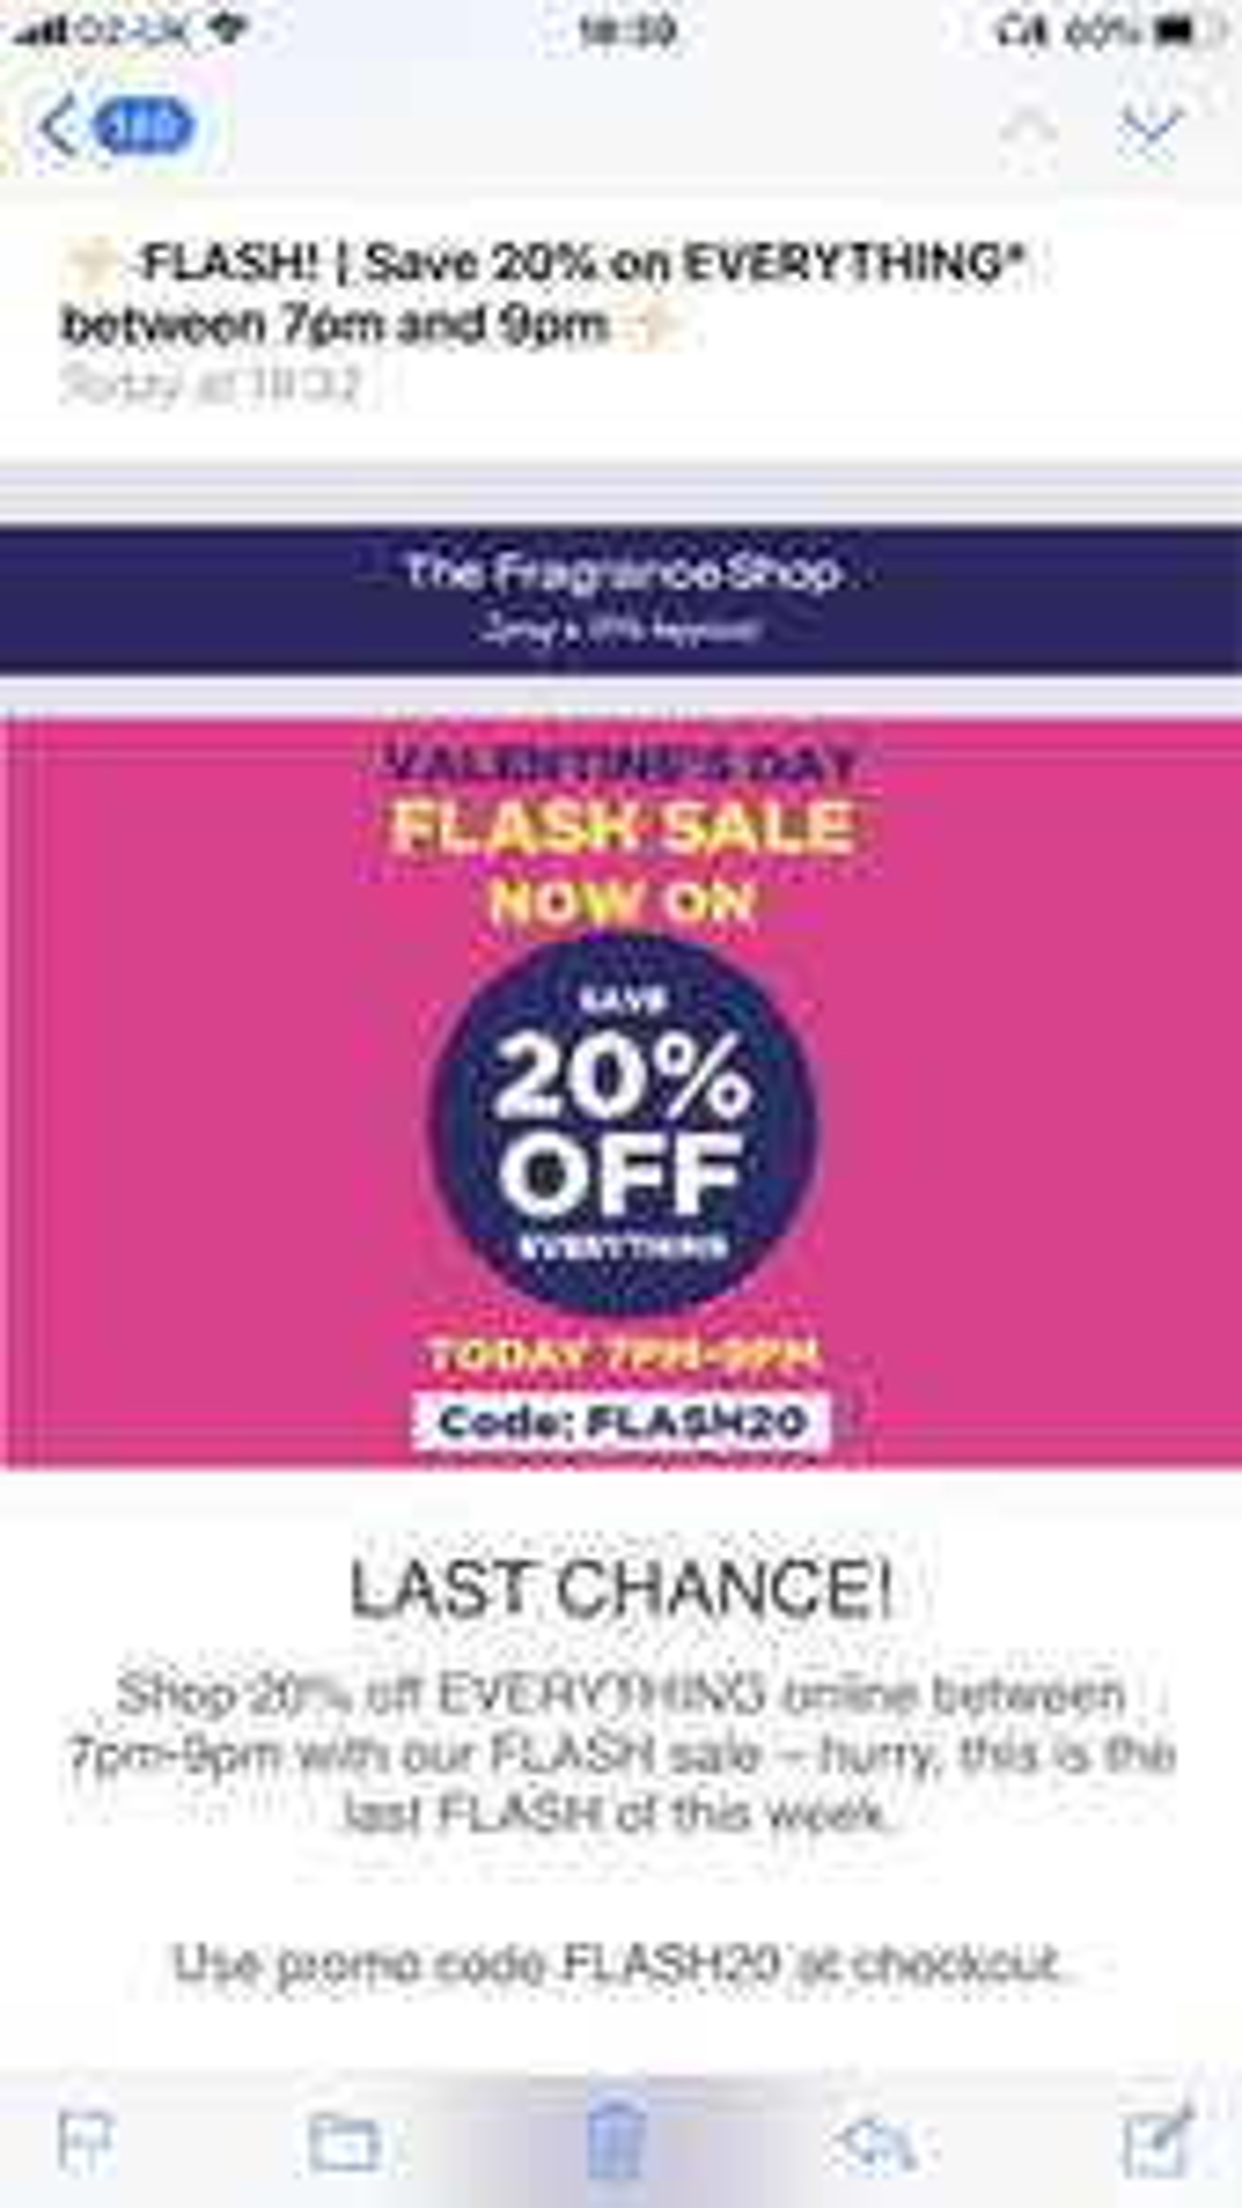 Fragrance Shop 20% off everything